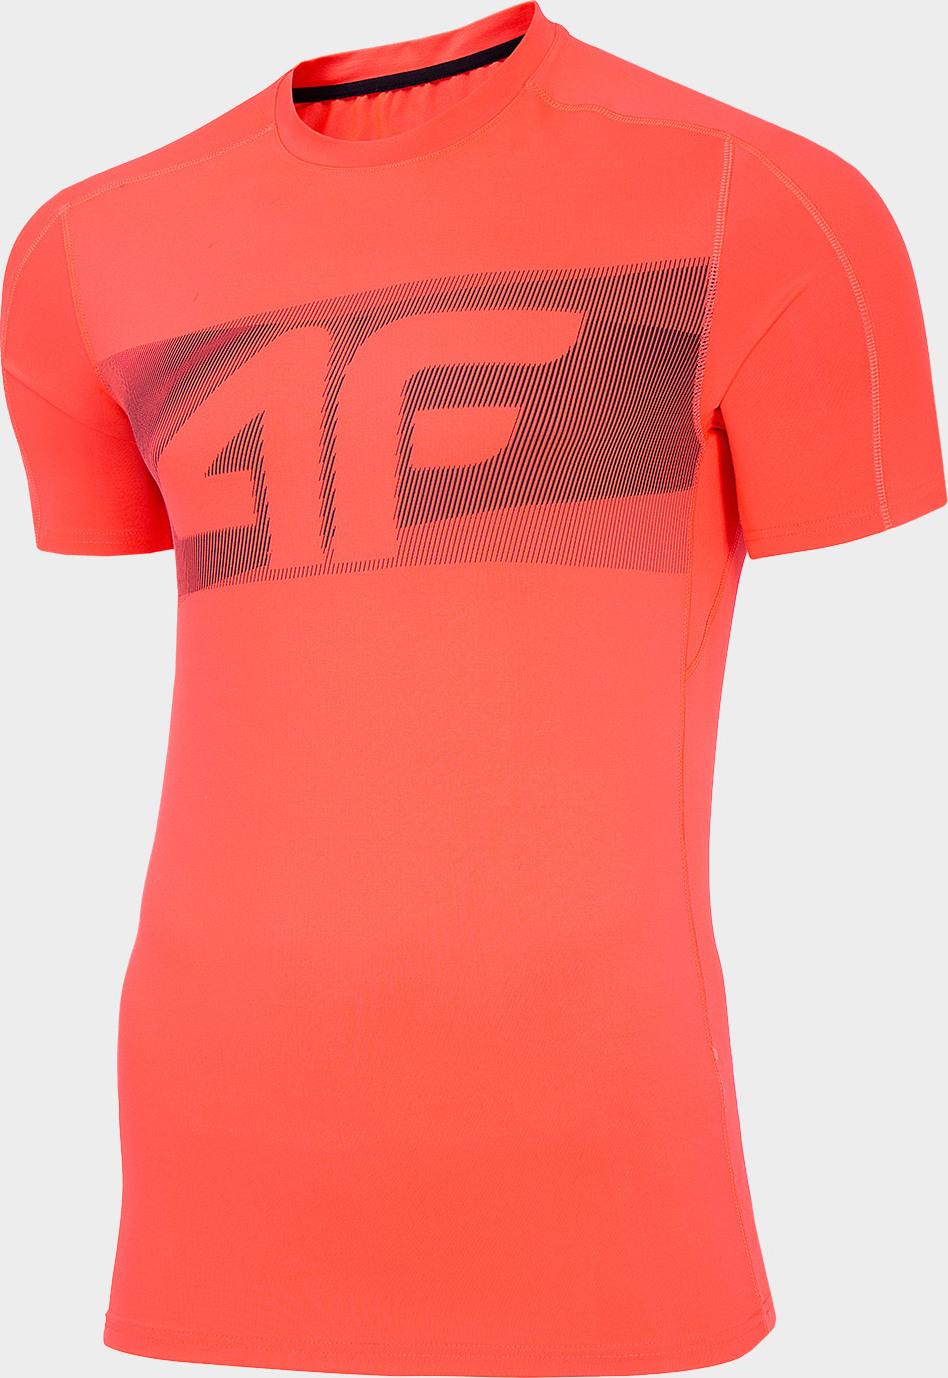 Pánske športové tričko 4F TSMF283 Červené červená XXL